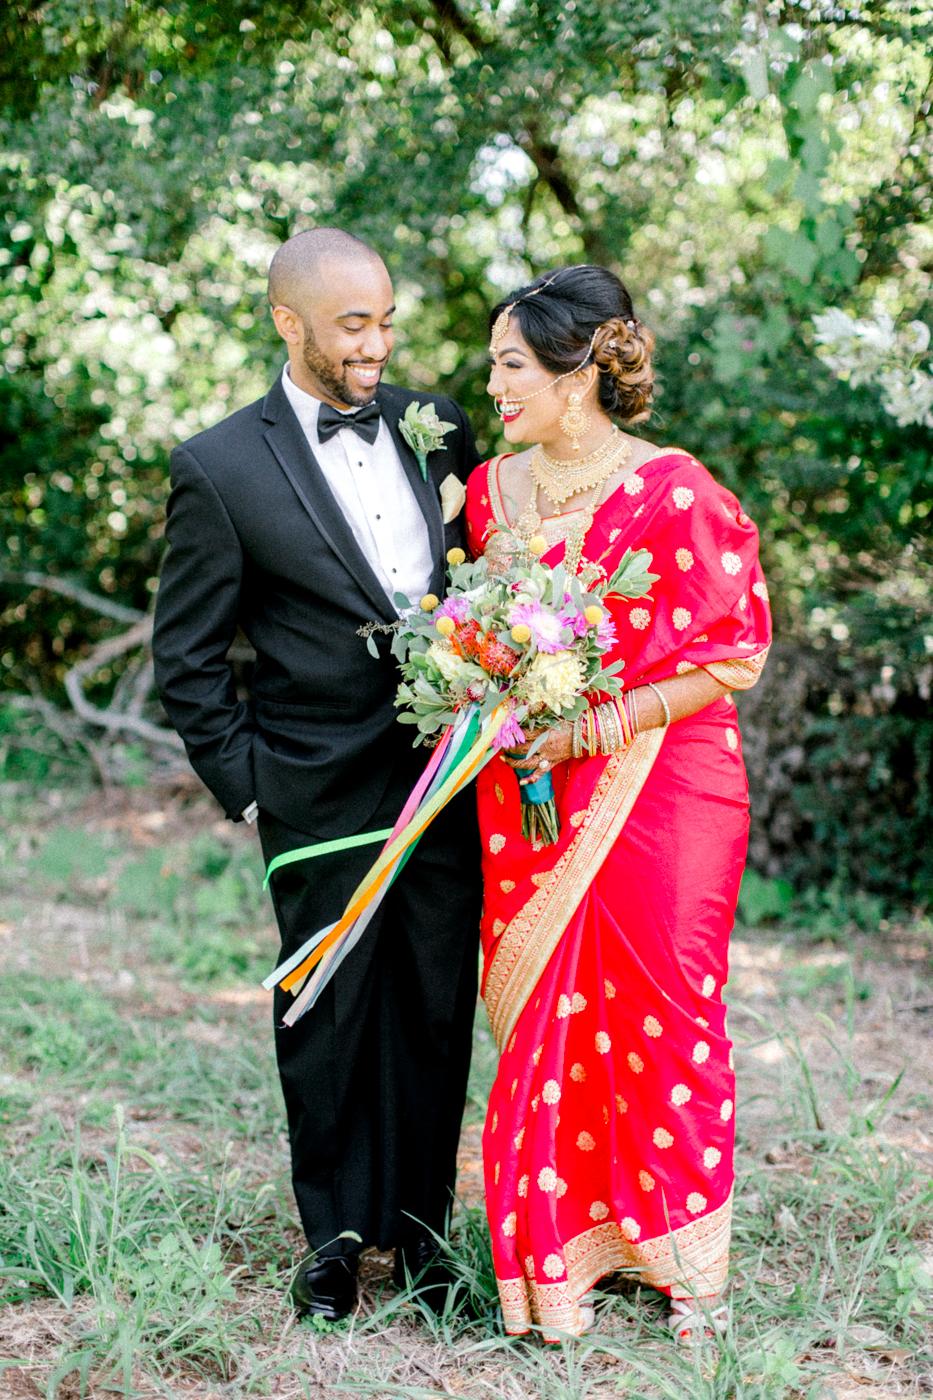 four corners photography atlanta wedding photographer indian wedding 550 trackside wedding atlanta indian wedding photographer (49 of 54).jpg